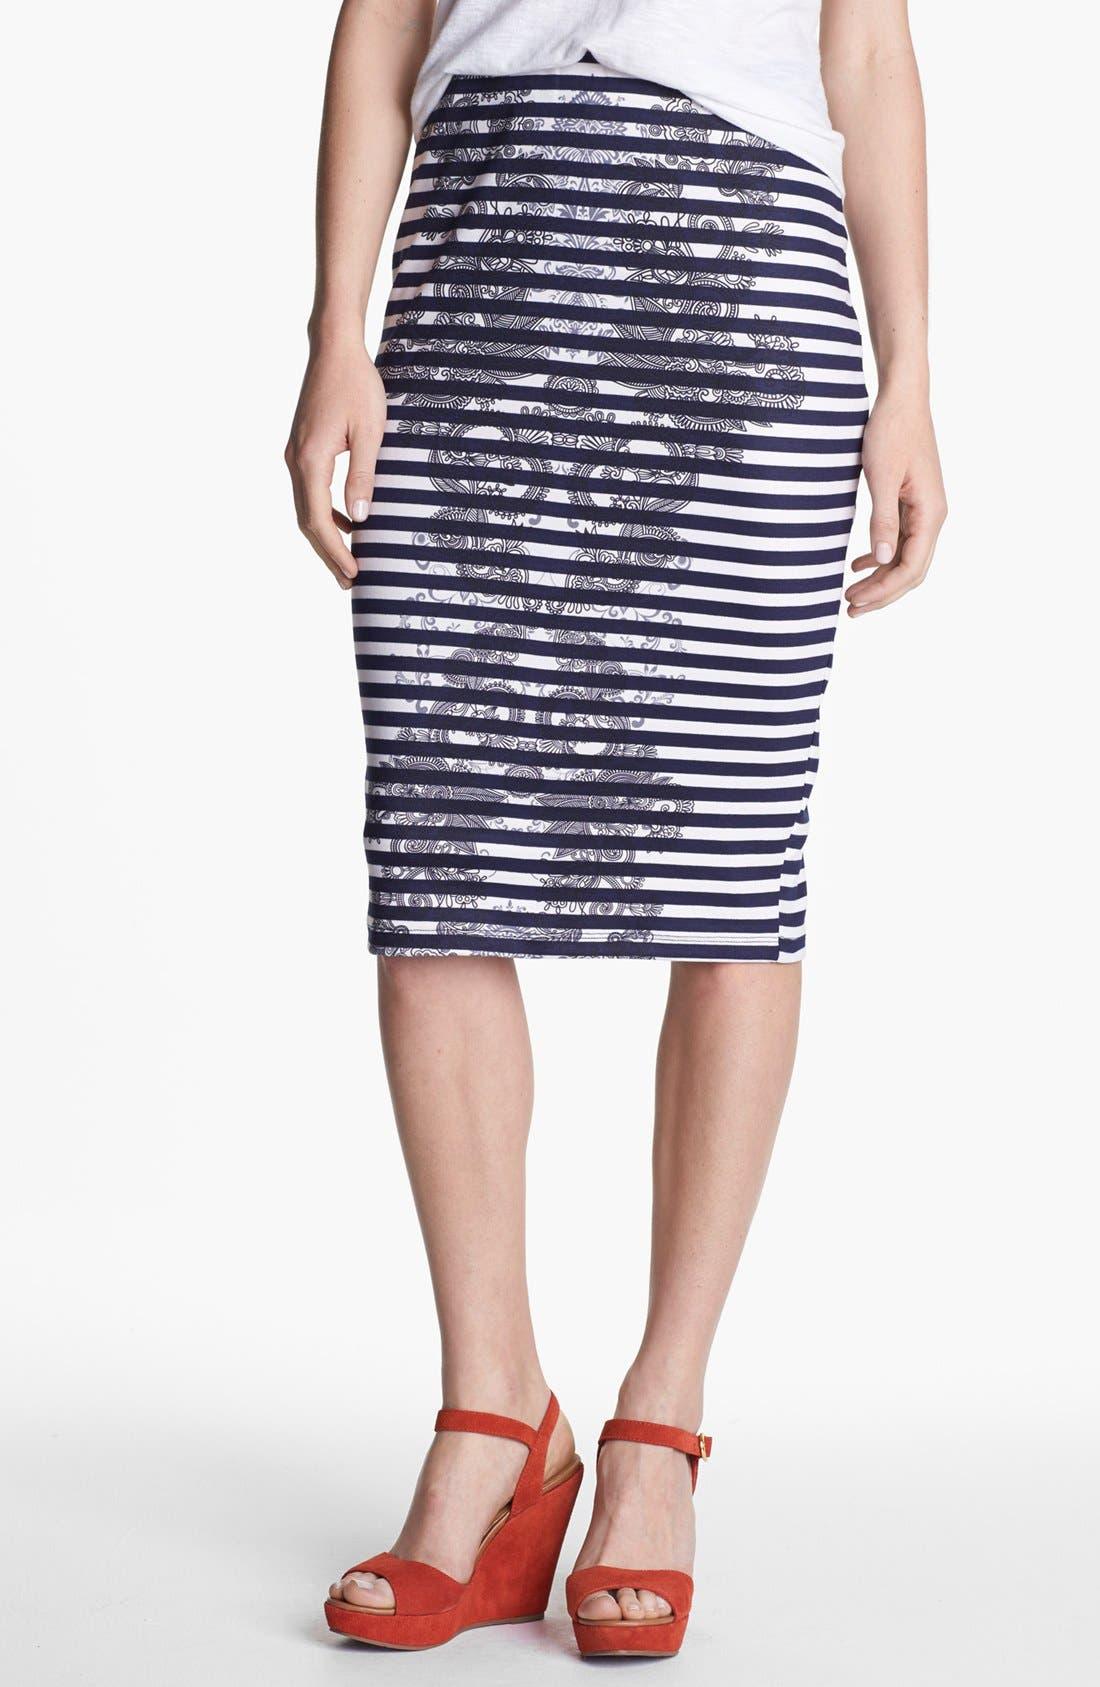 Alternate Image 1 Selected - Bobeau Print Ponte Knit Pencil Skirt